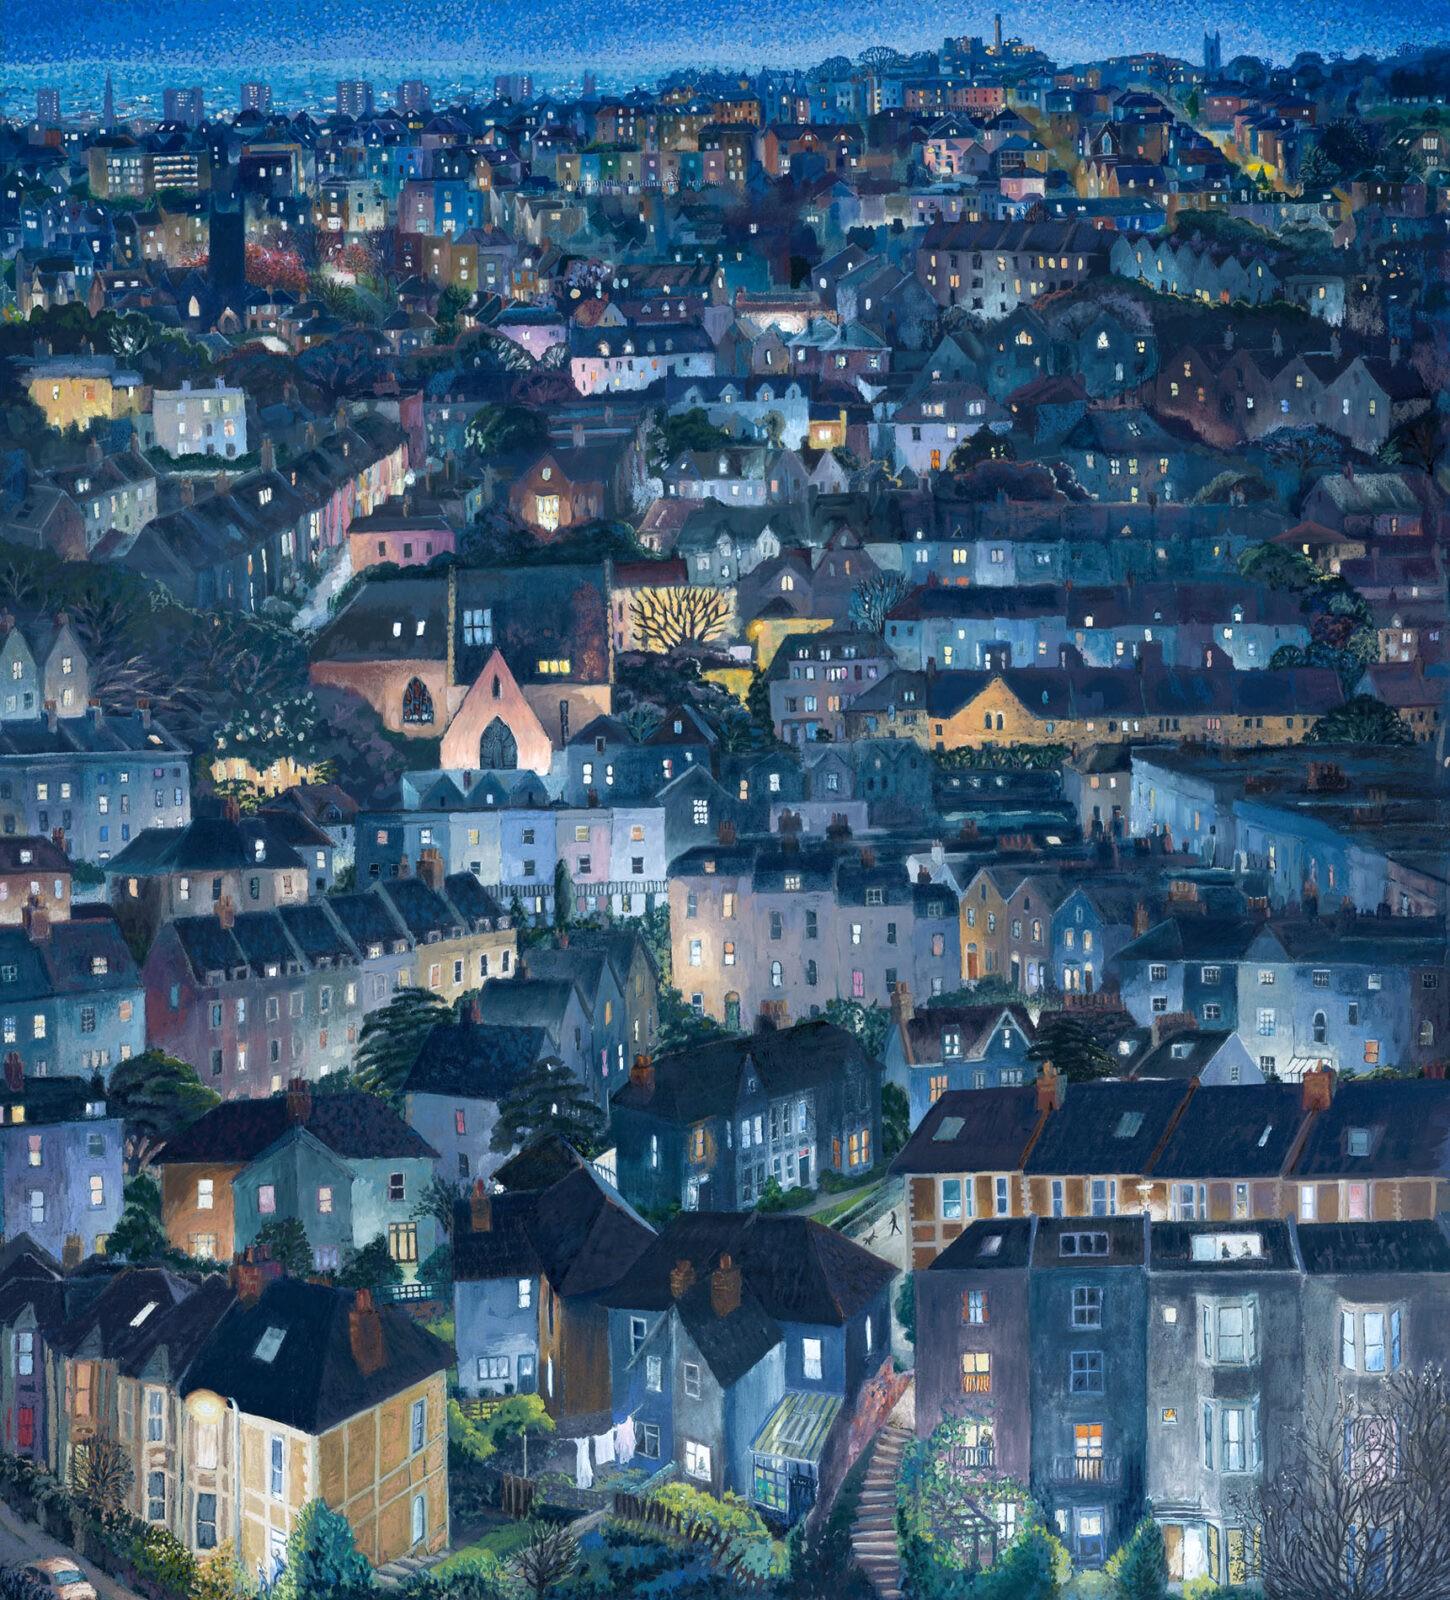 Cath Read: Provincial English Landscapes